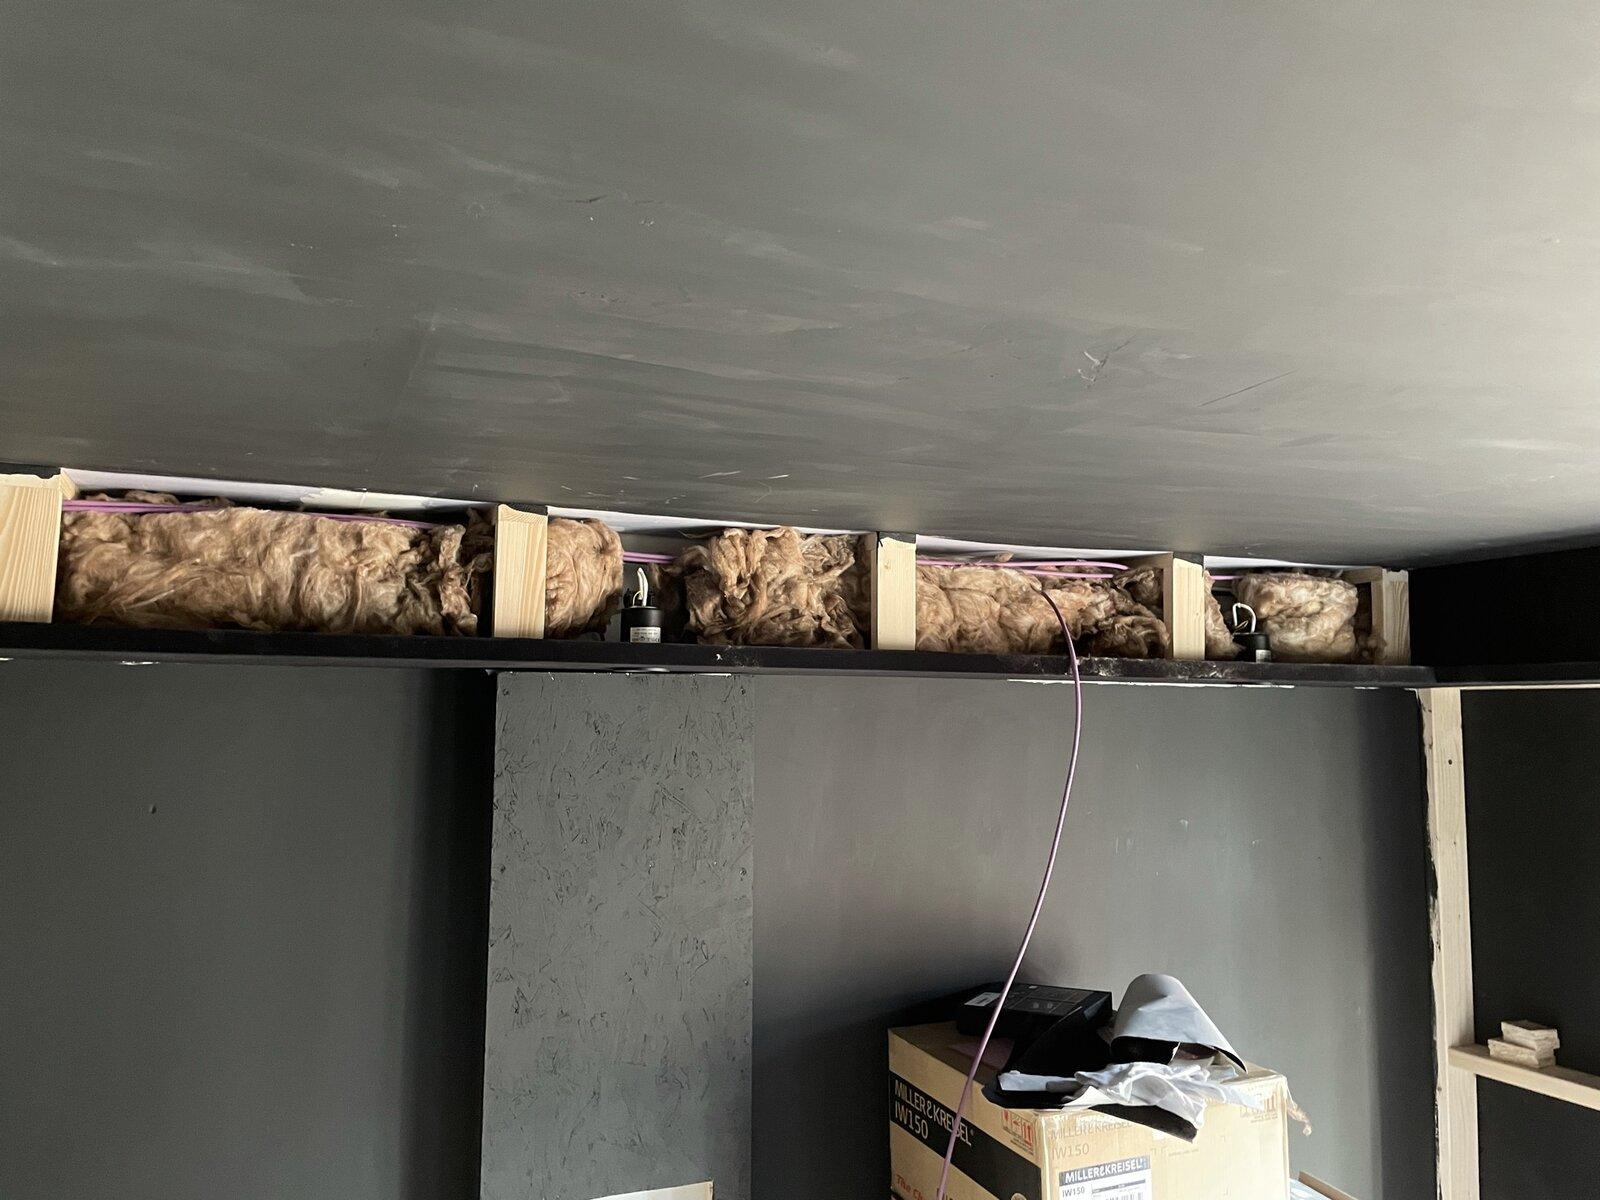 bulkhead insulation